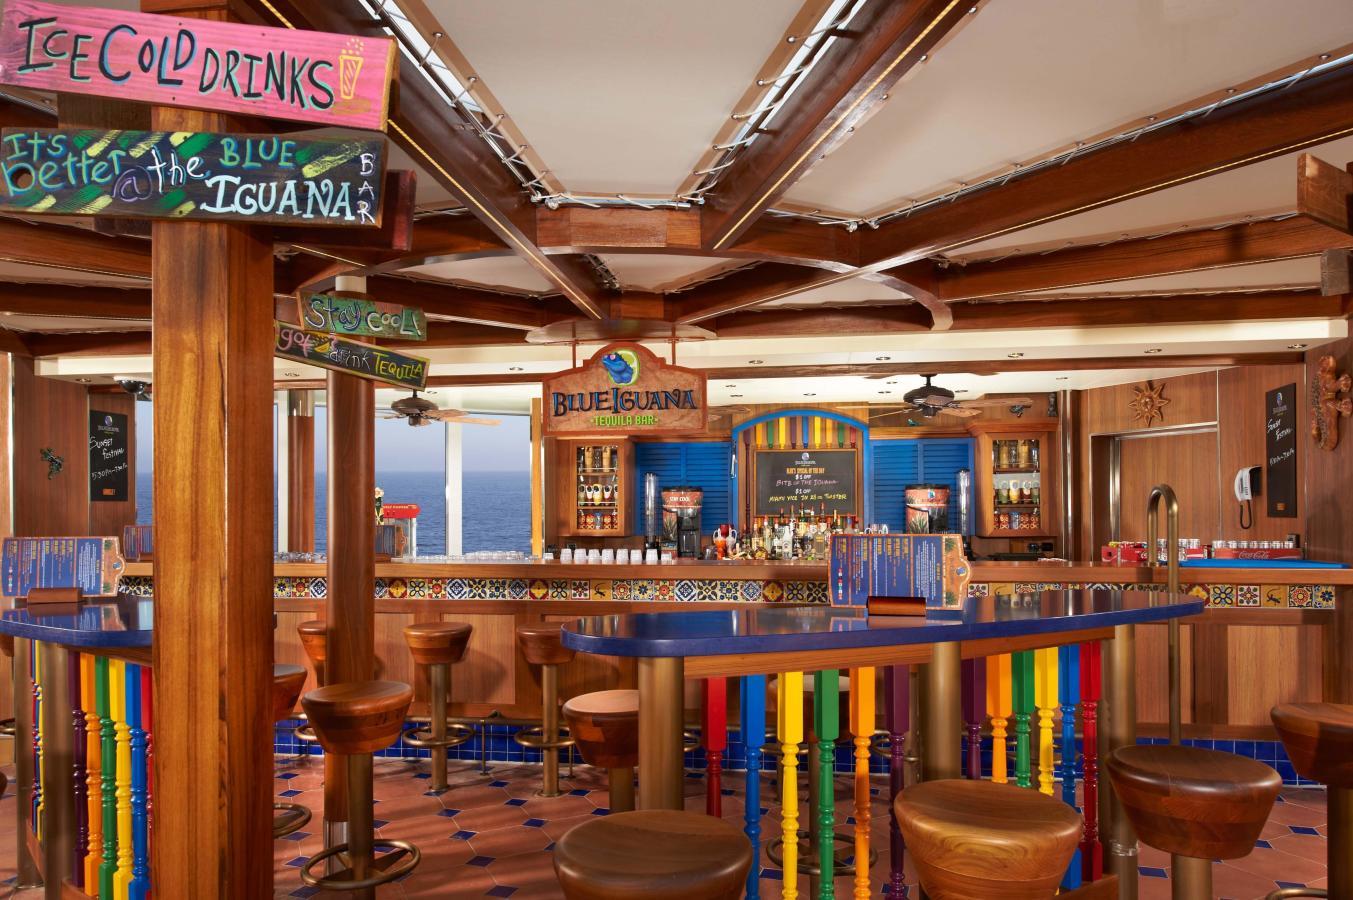 Carnival's BlueIguana Tequila Bar